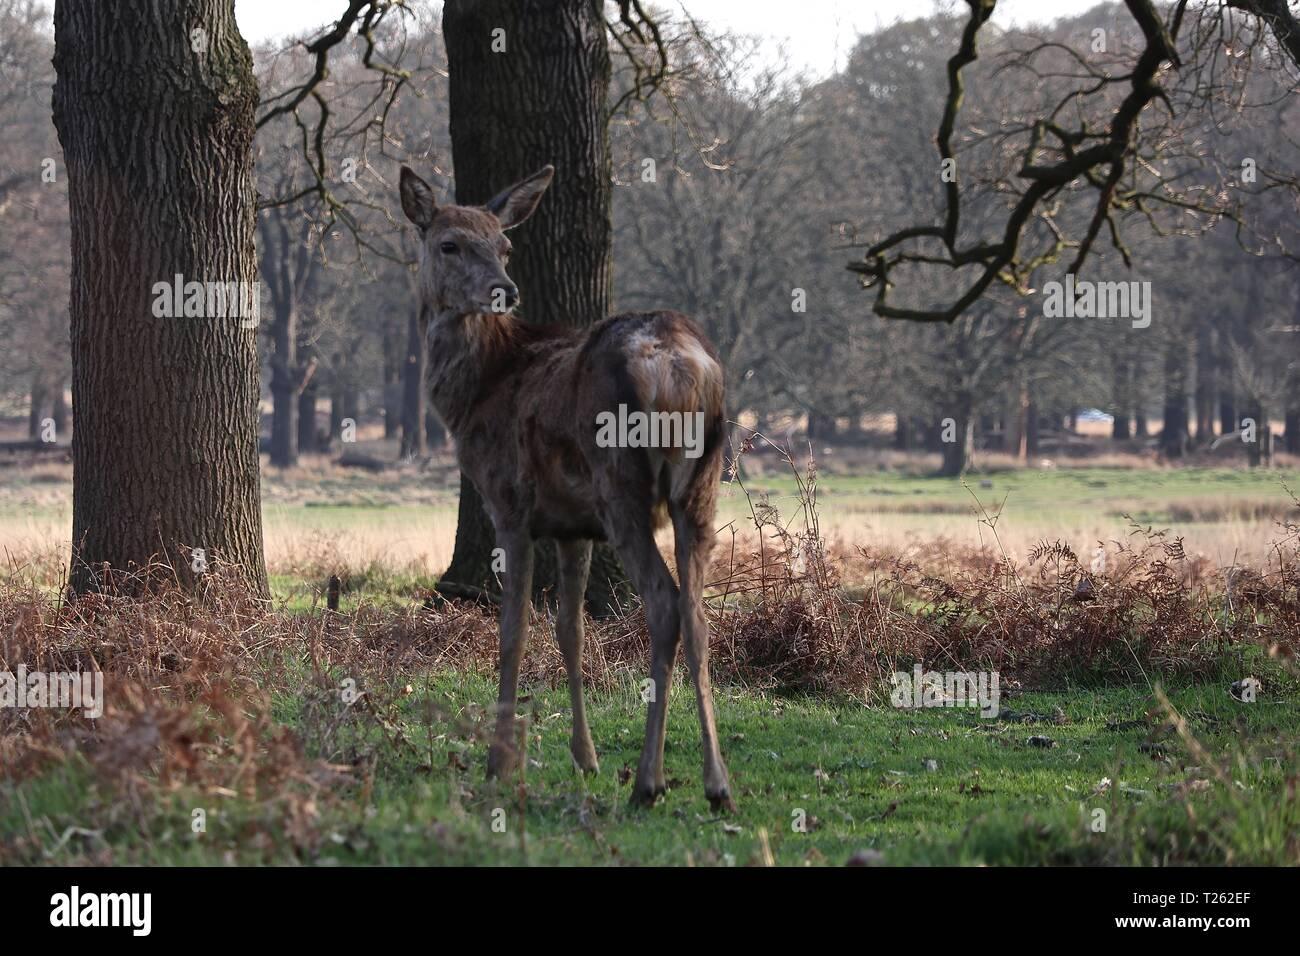 Deer in Richmond Park London England 2019 - Stock Image